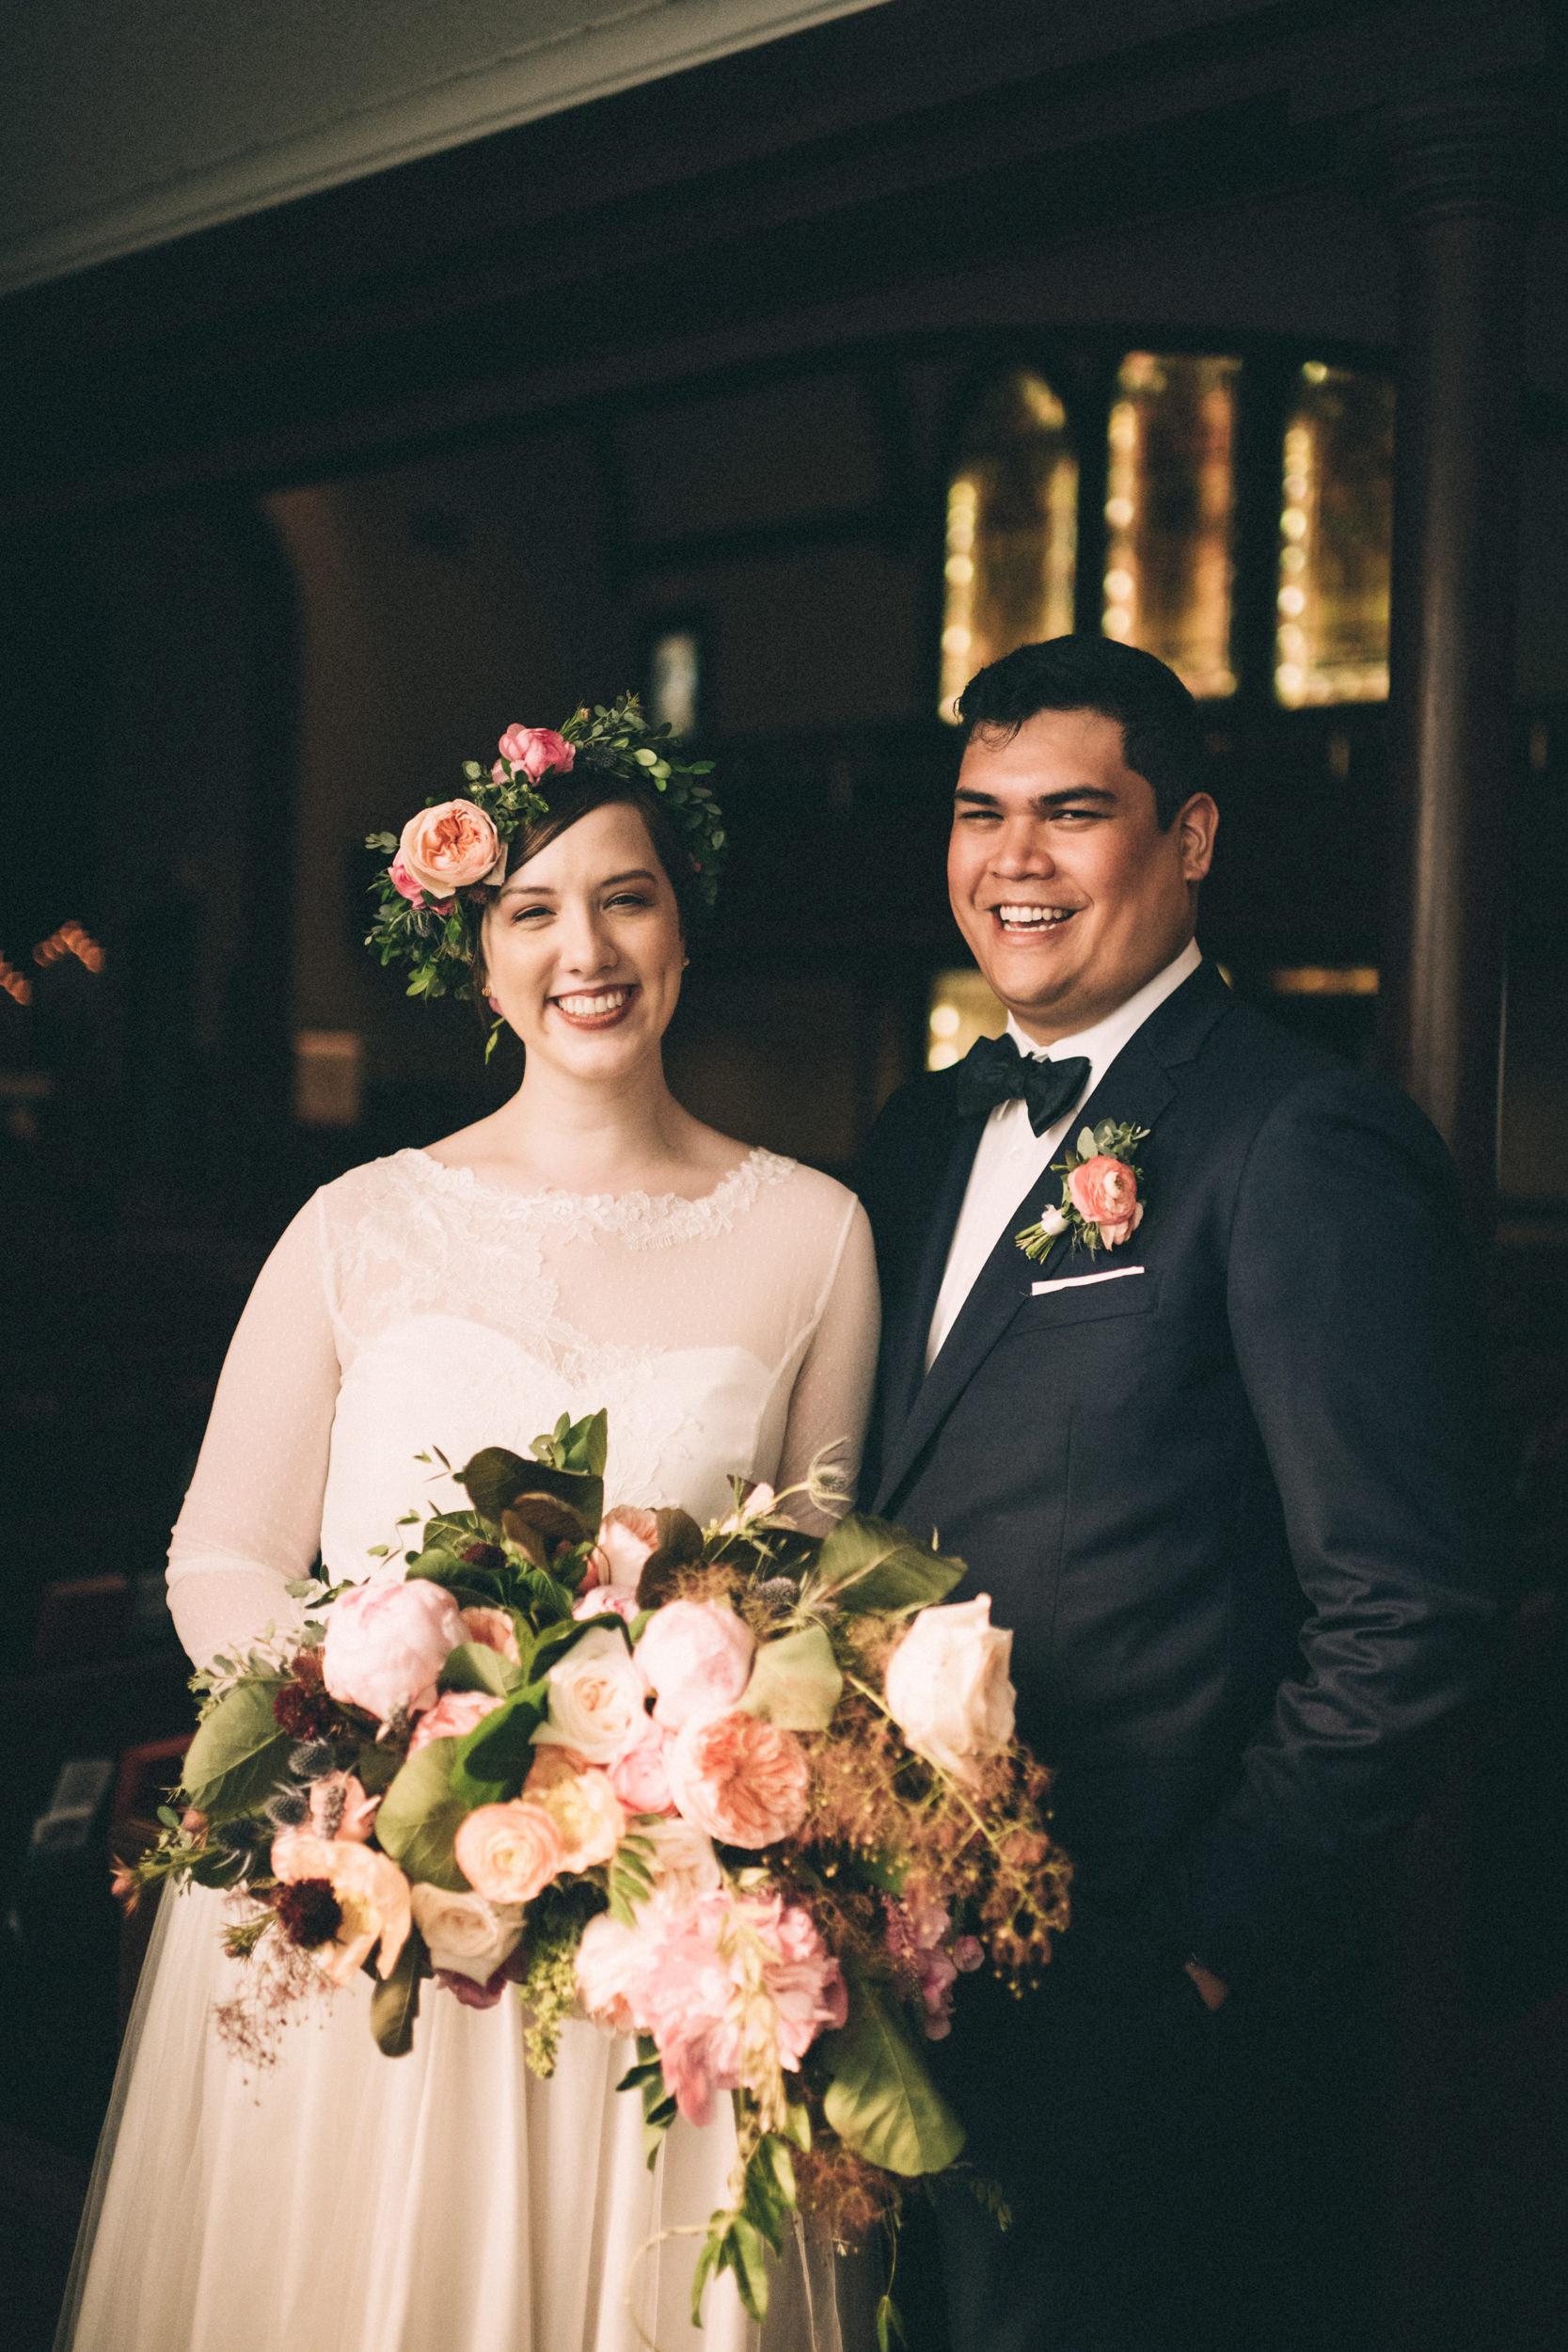 lauren-dean-wedding-grand-lodge-kentucky-sarah-katherine-davis-photography-449edit.jpg